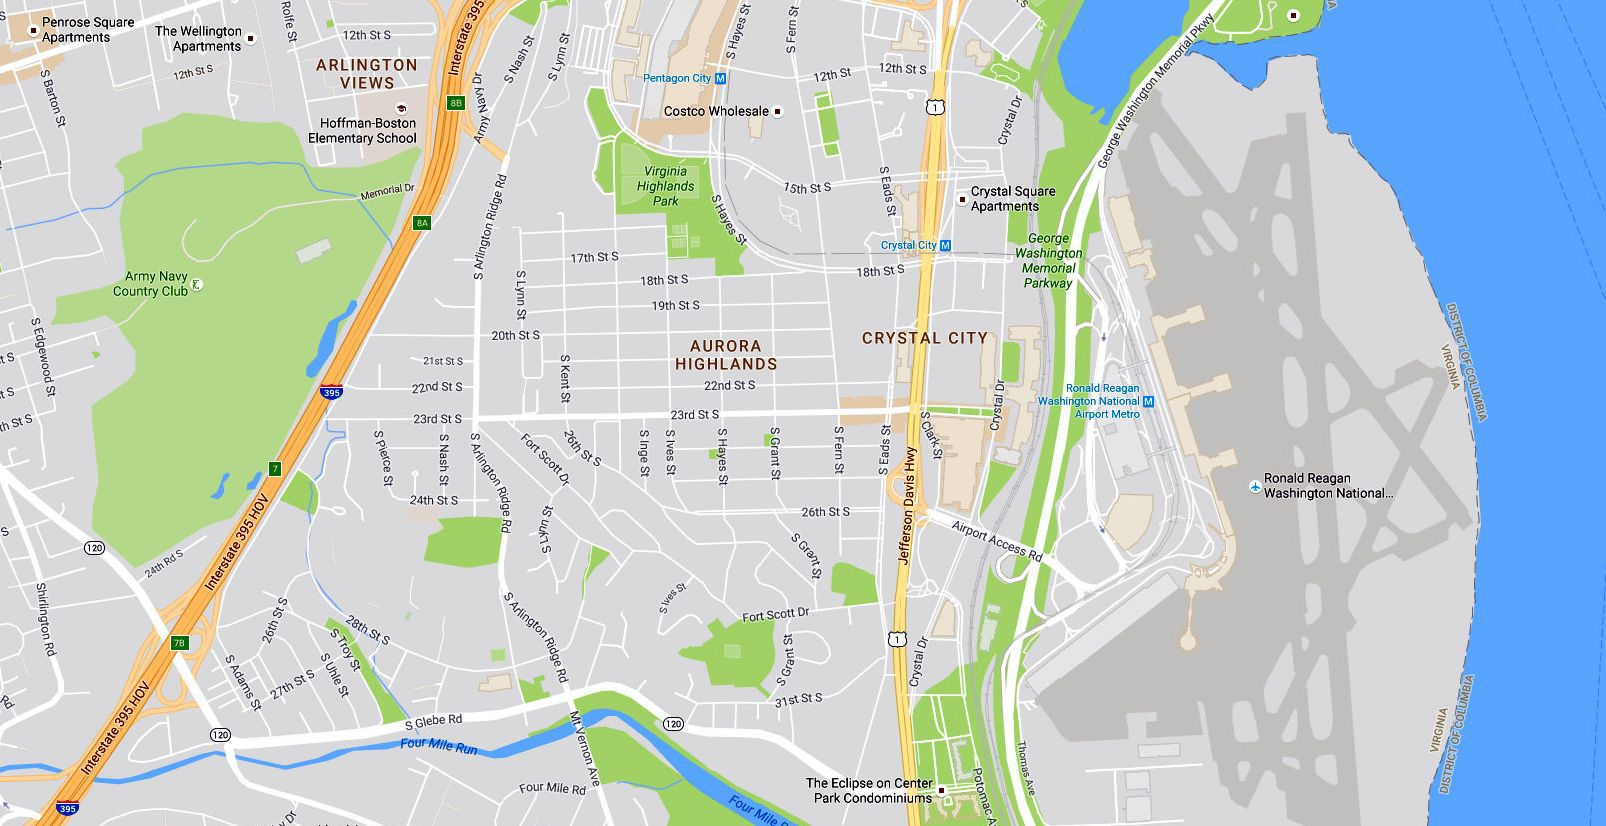 Crystal City Maps Arlington Virginia Directions